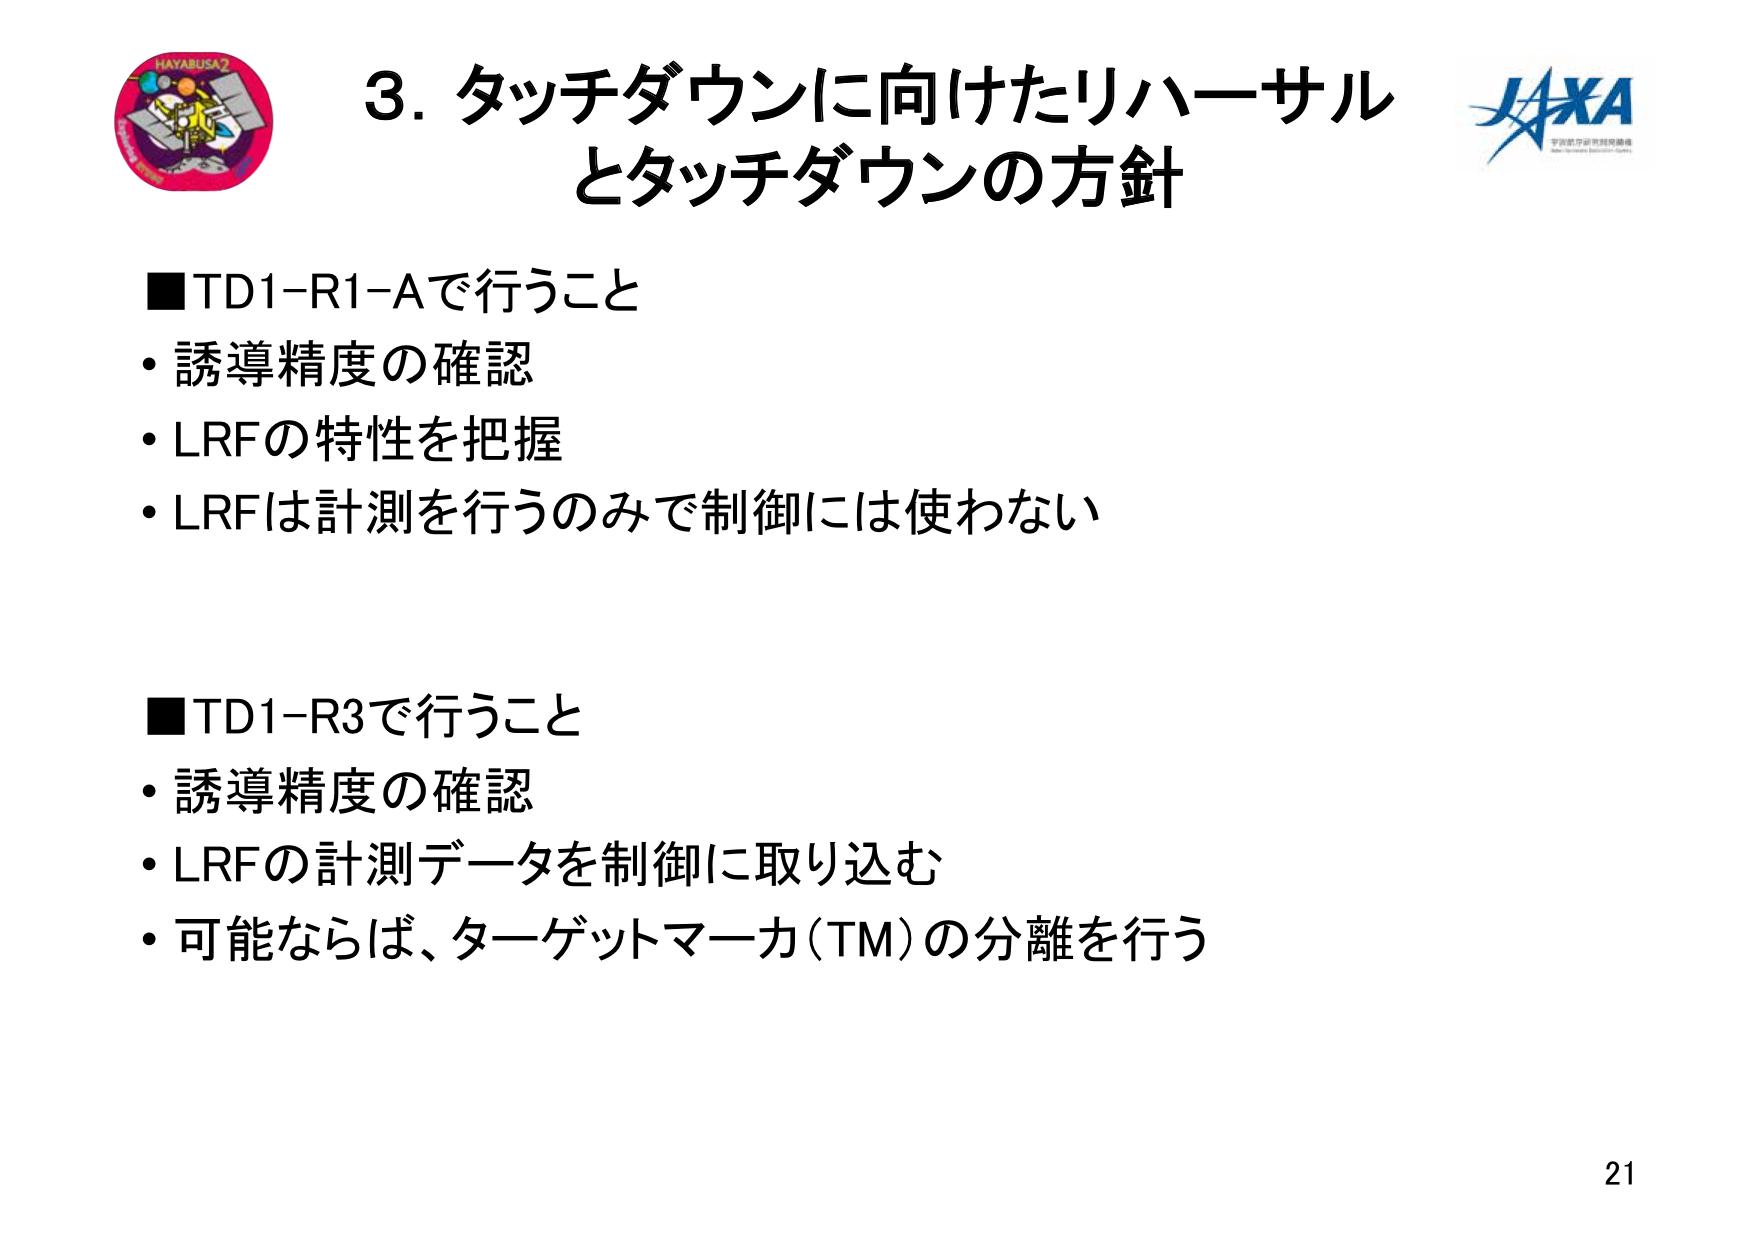 f:id:Imamura:20181011154000p:plain